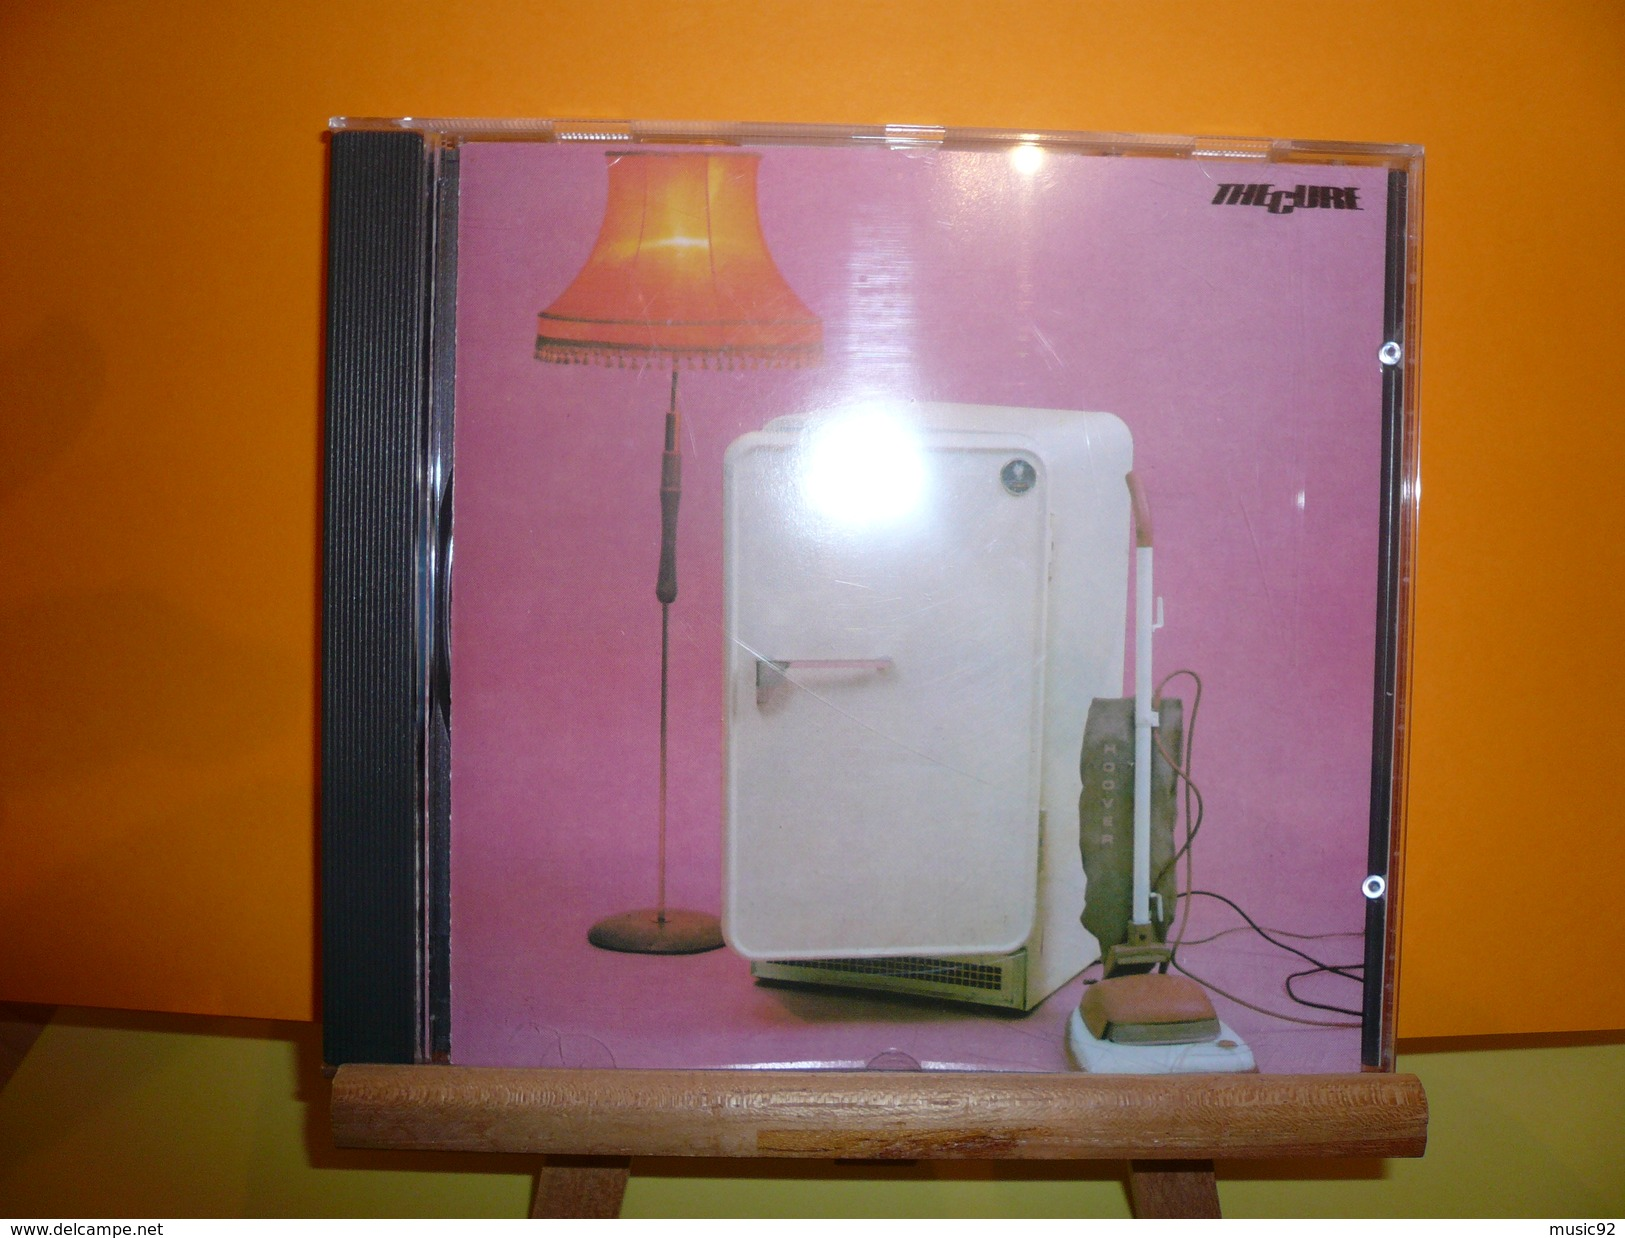 The Cure - CD Album - Three Imaginary Boys - New Age